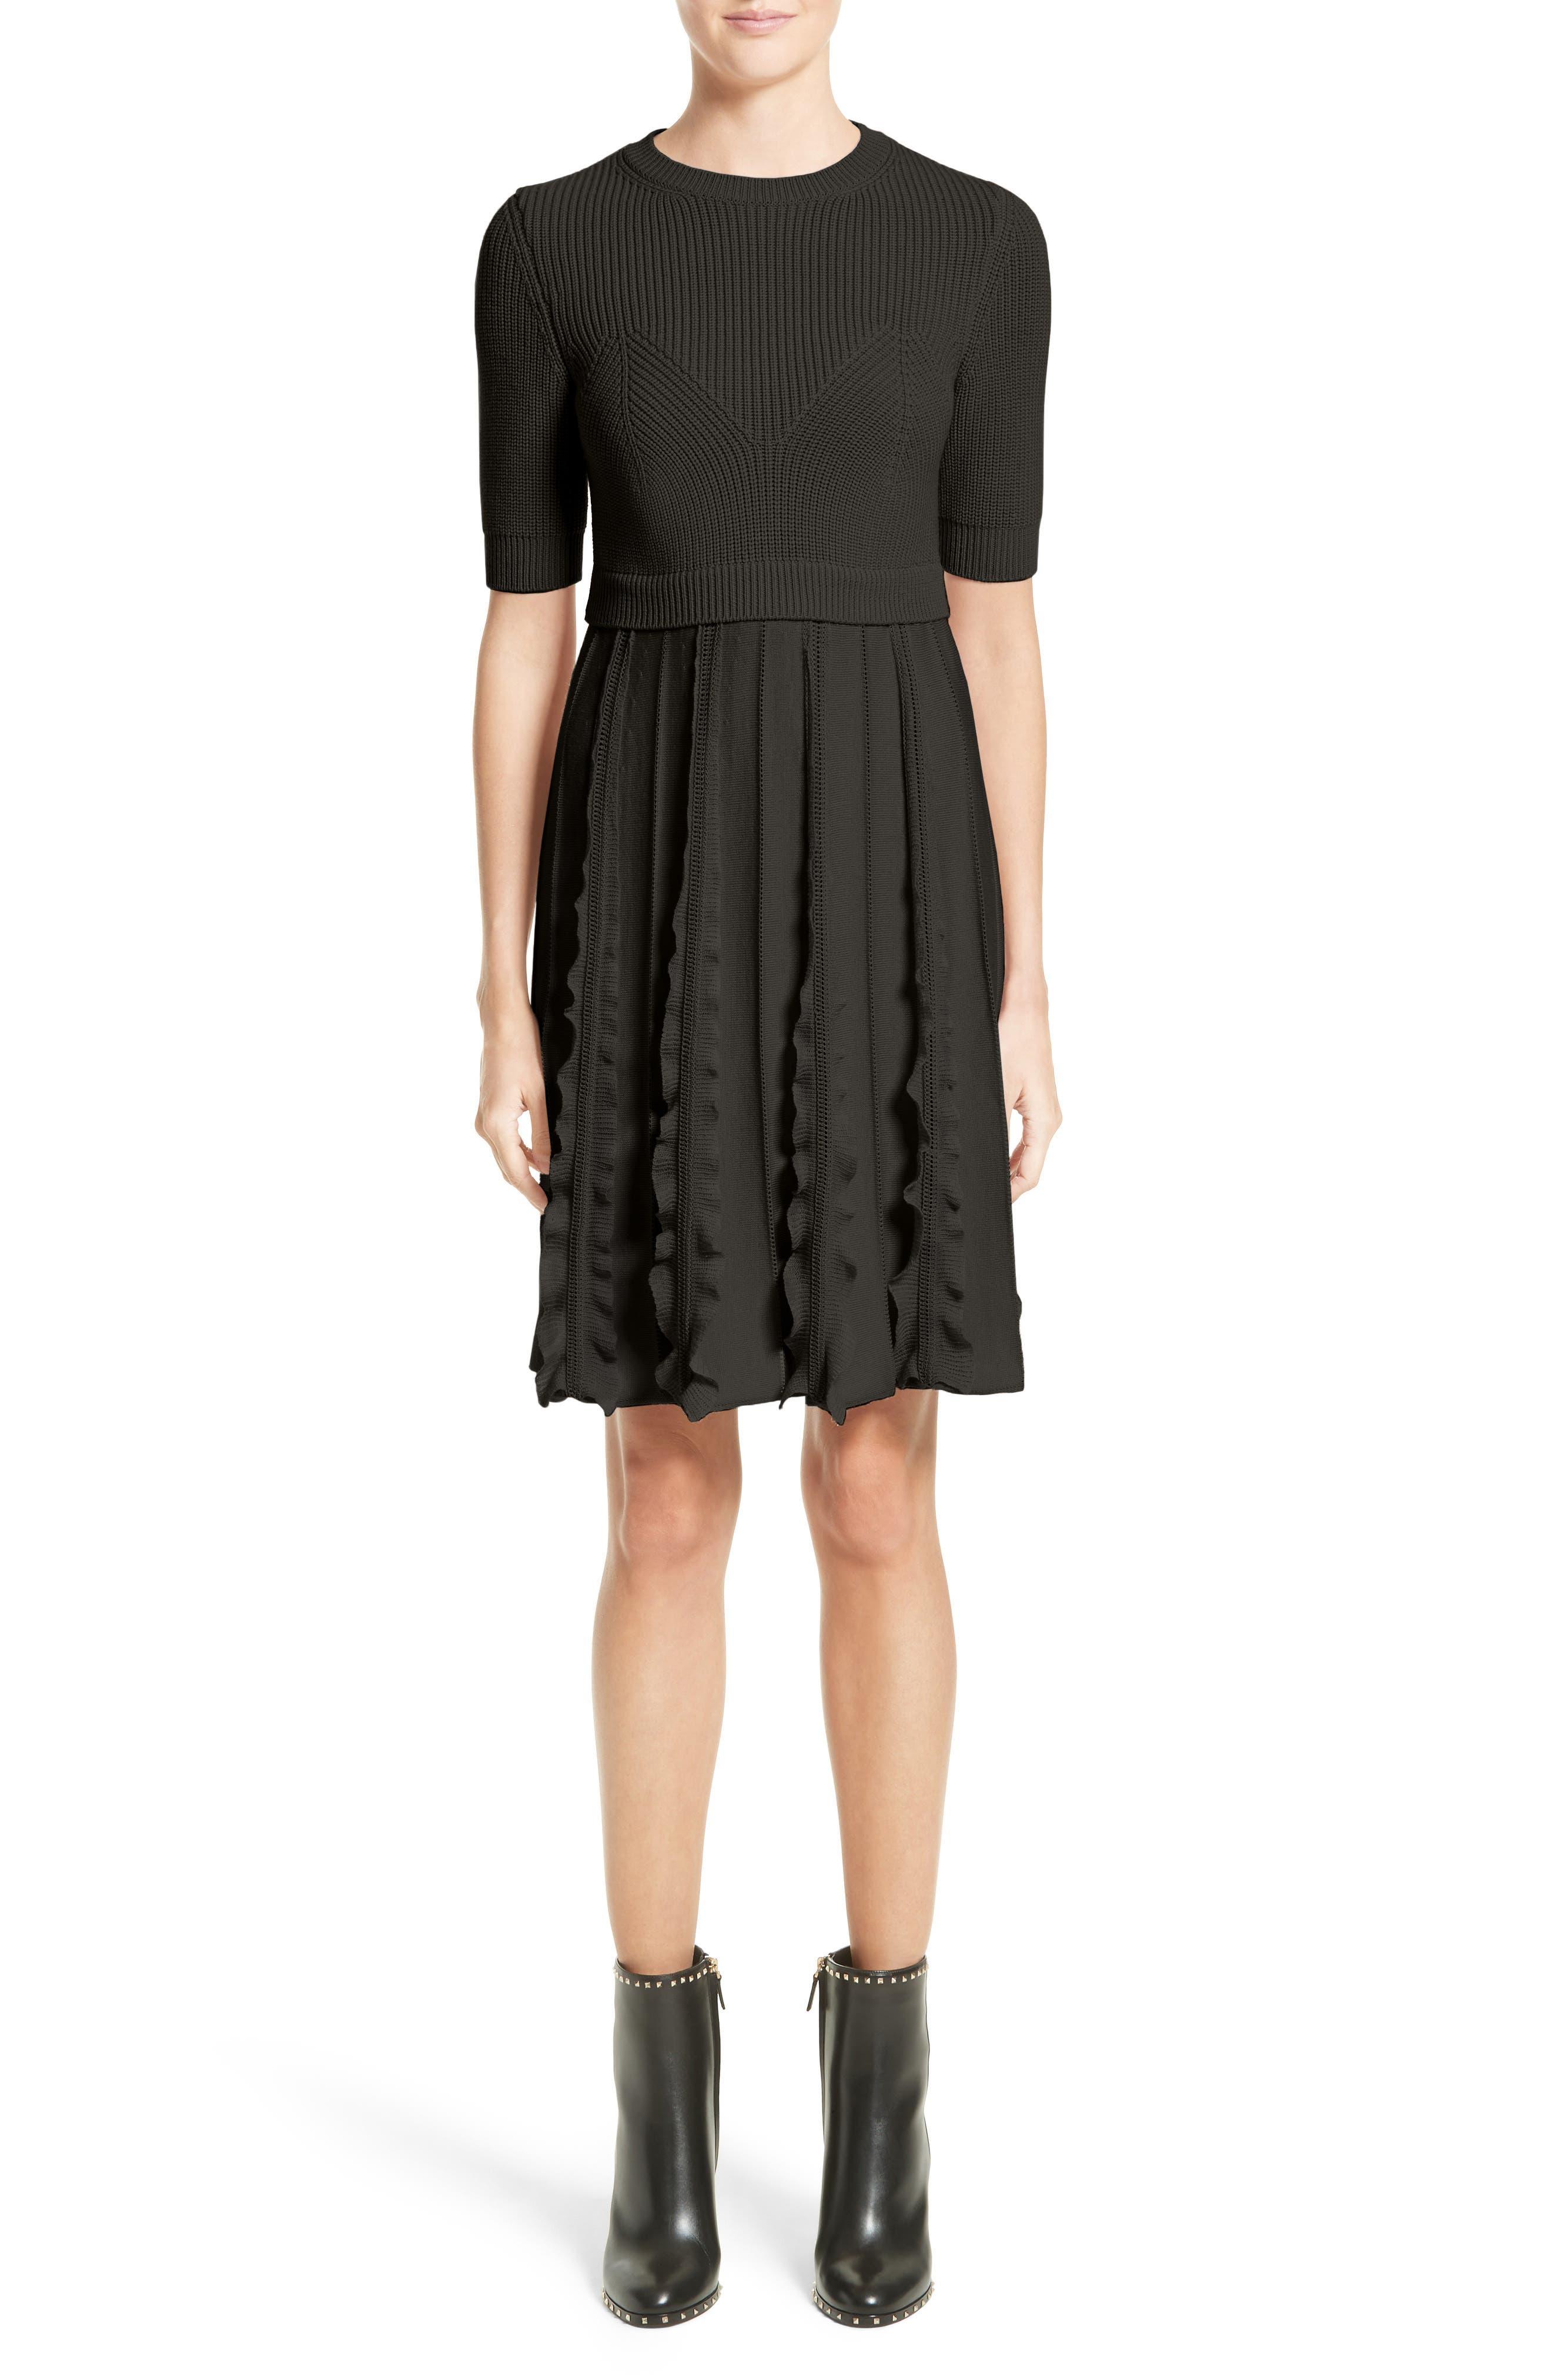 Valentino Virgin Wool Knit Dress